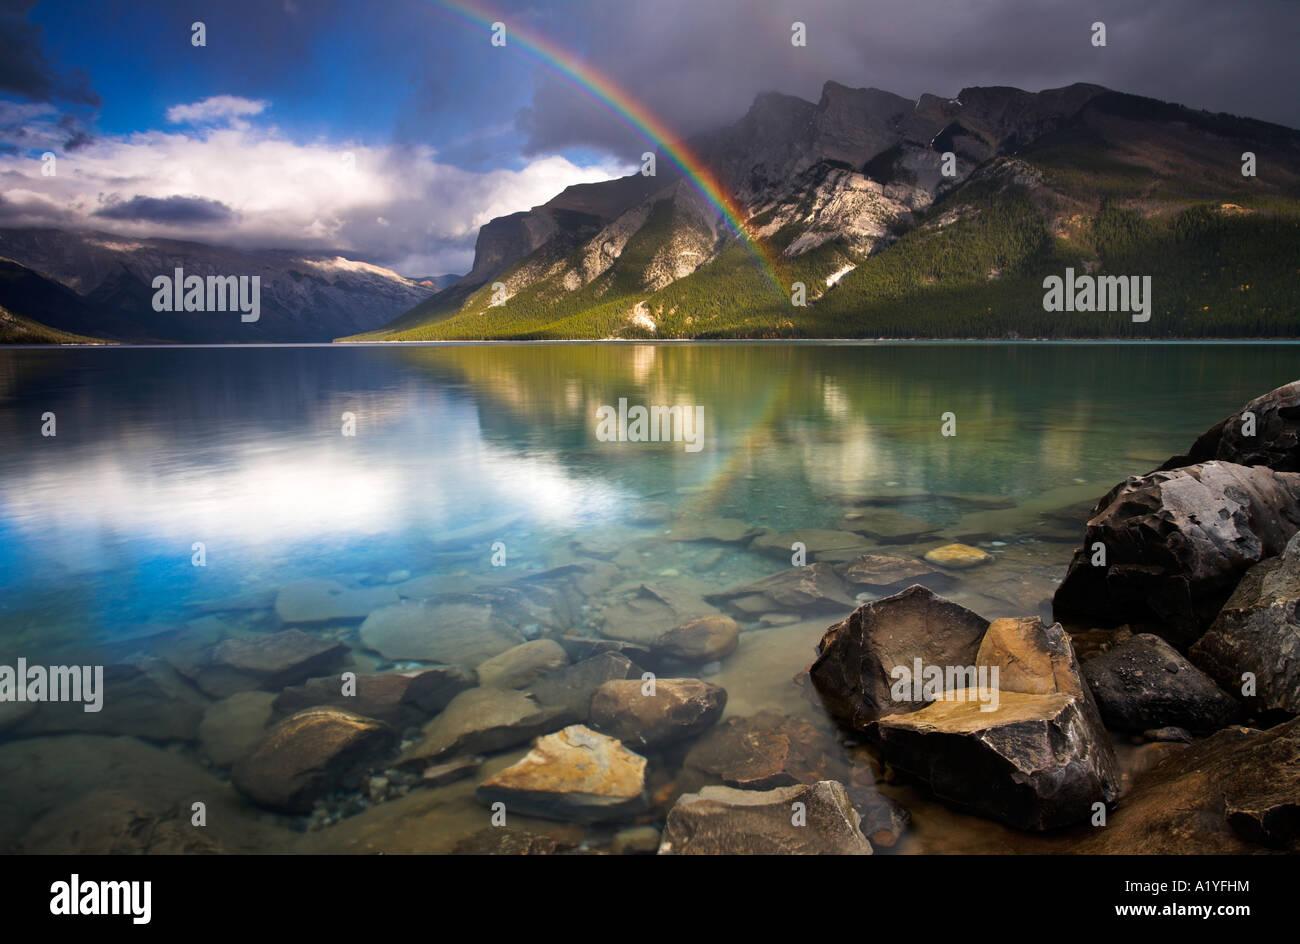 Regenbogen über Lake Minnewanka, Banff Nationalpark, Alberta, Kanada Stockbild